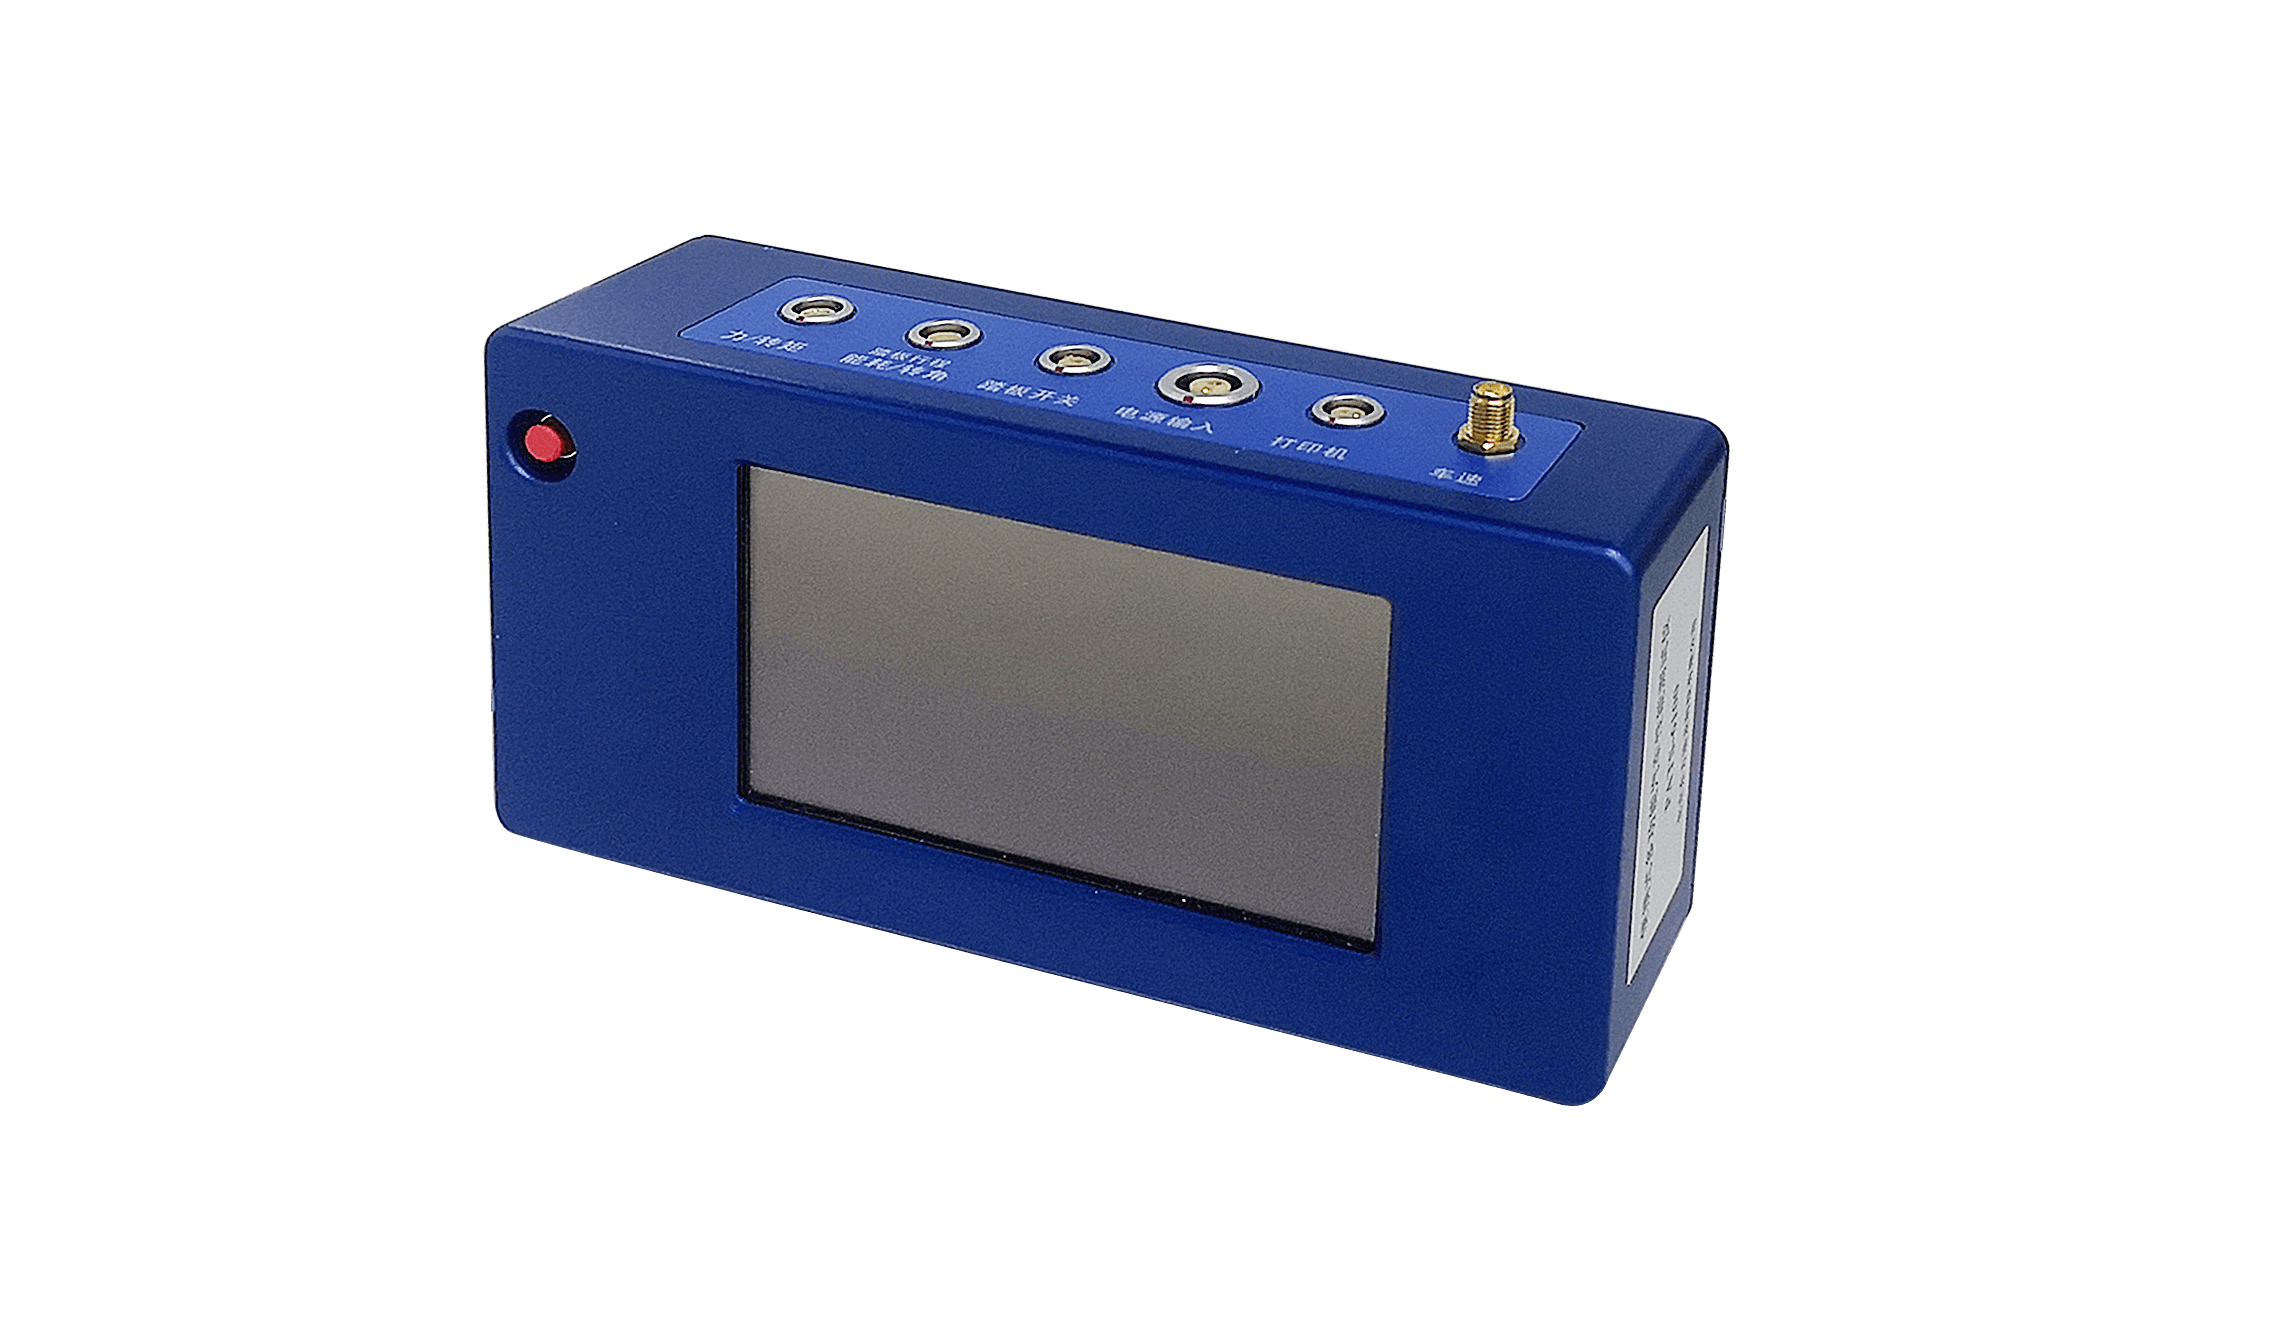 VEM-5S单天线测试记录仪